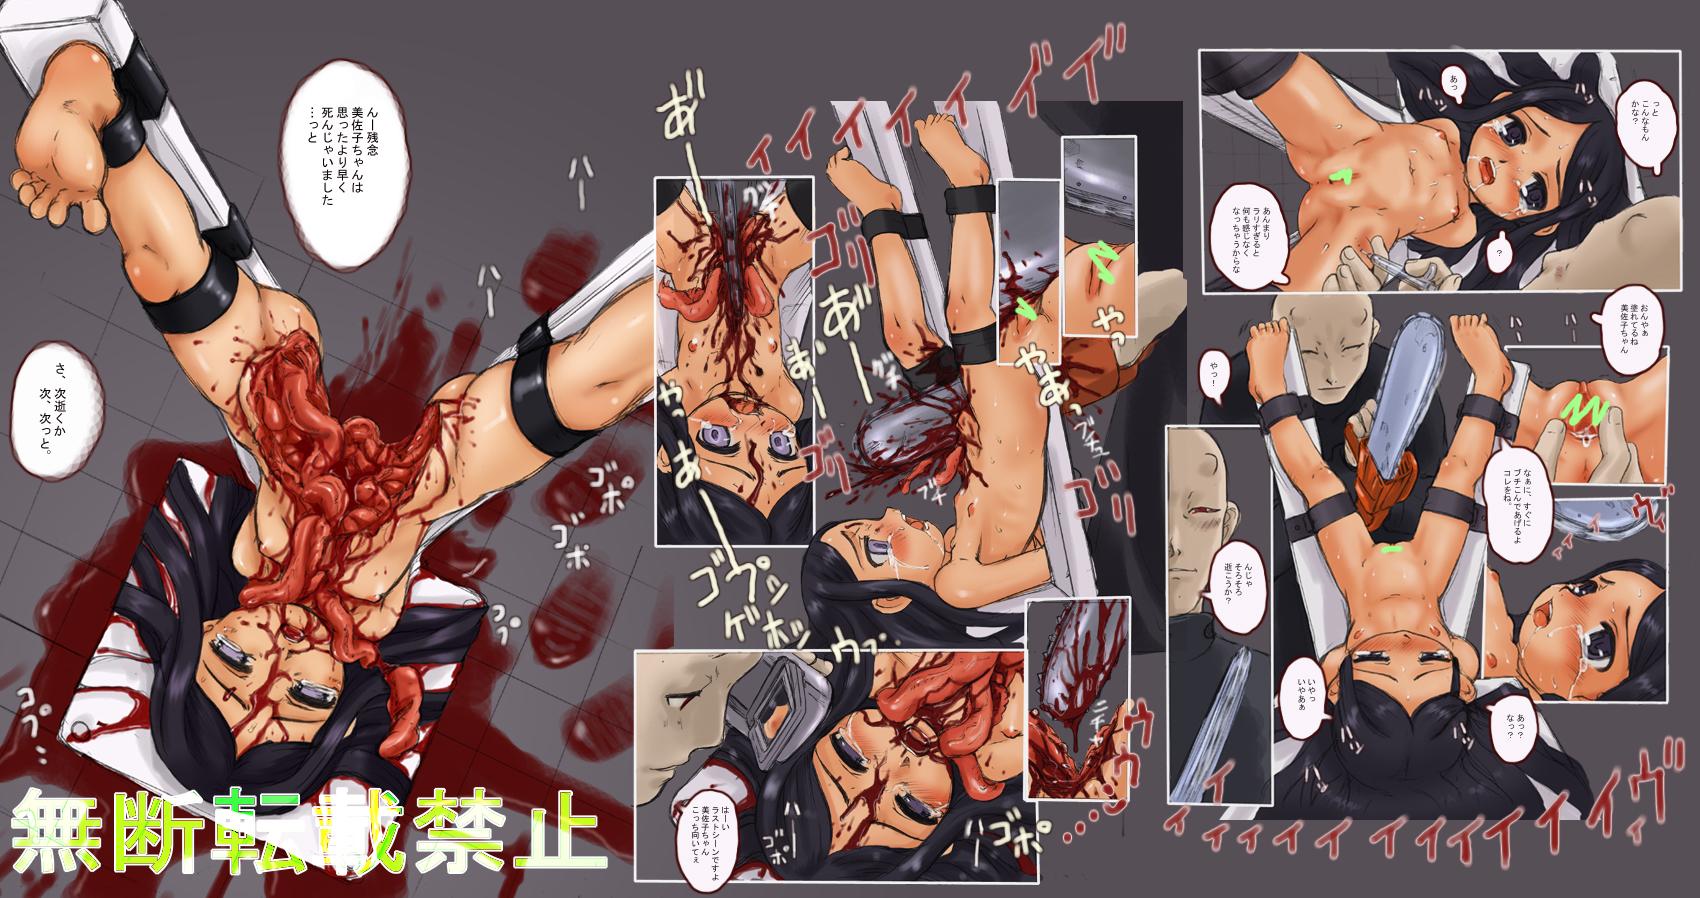 Dead blood hentai hentia scenes